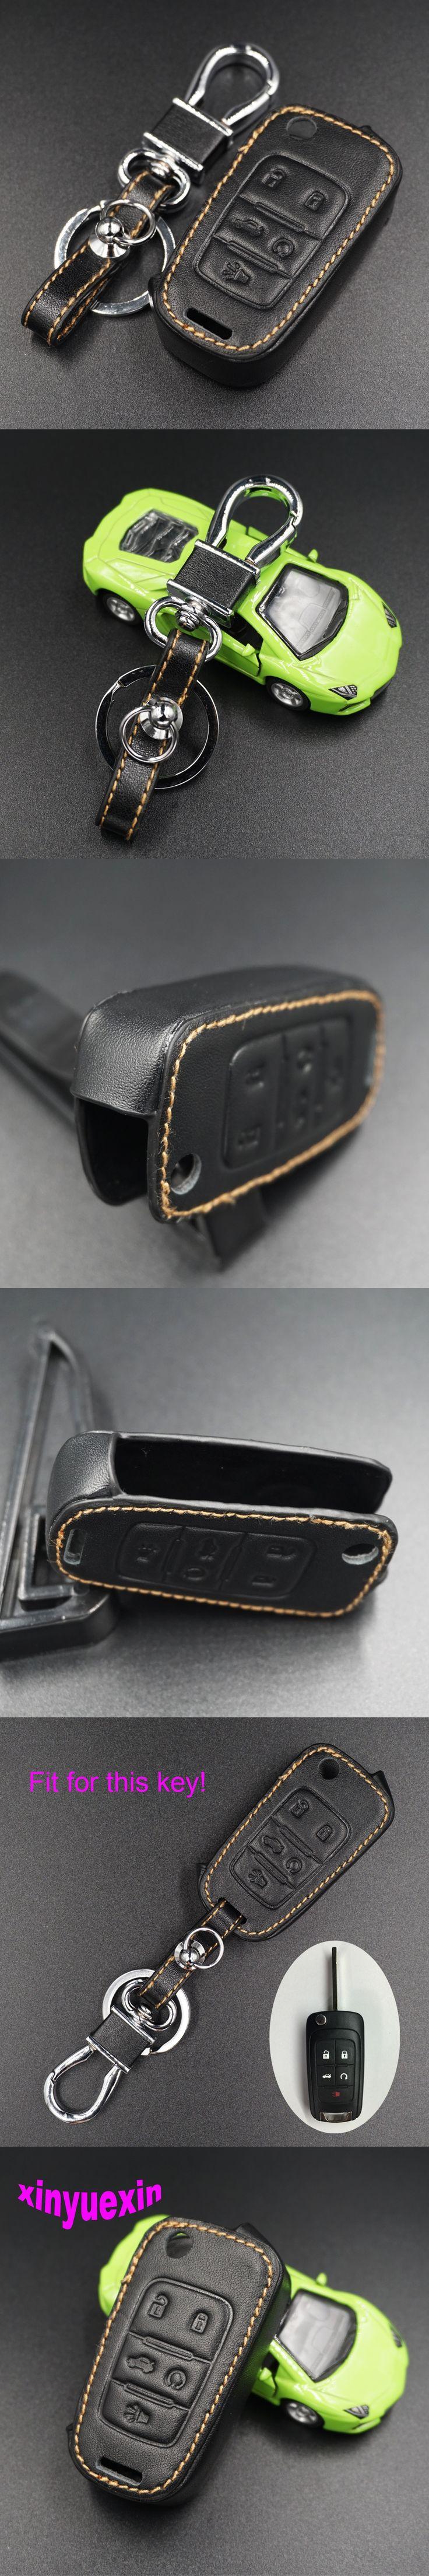 Xinyuexin Leather Car Key Cover Fob Case For Chevrolet Equinox Camaro AVEO Impala GMC Terrain Flip Remote Key Jacket Car-stying